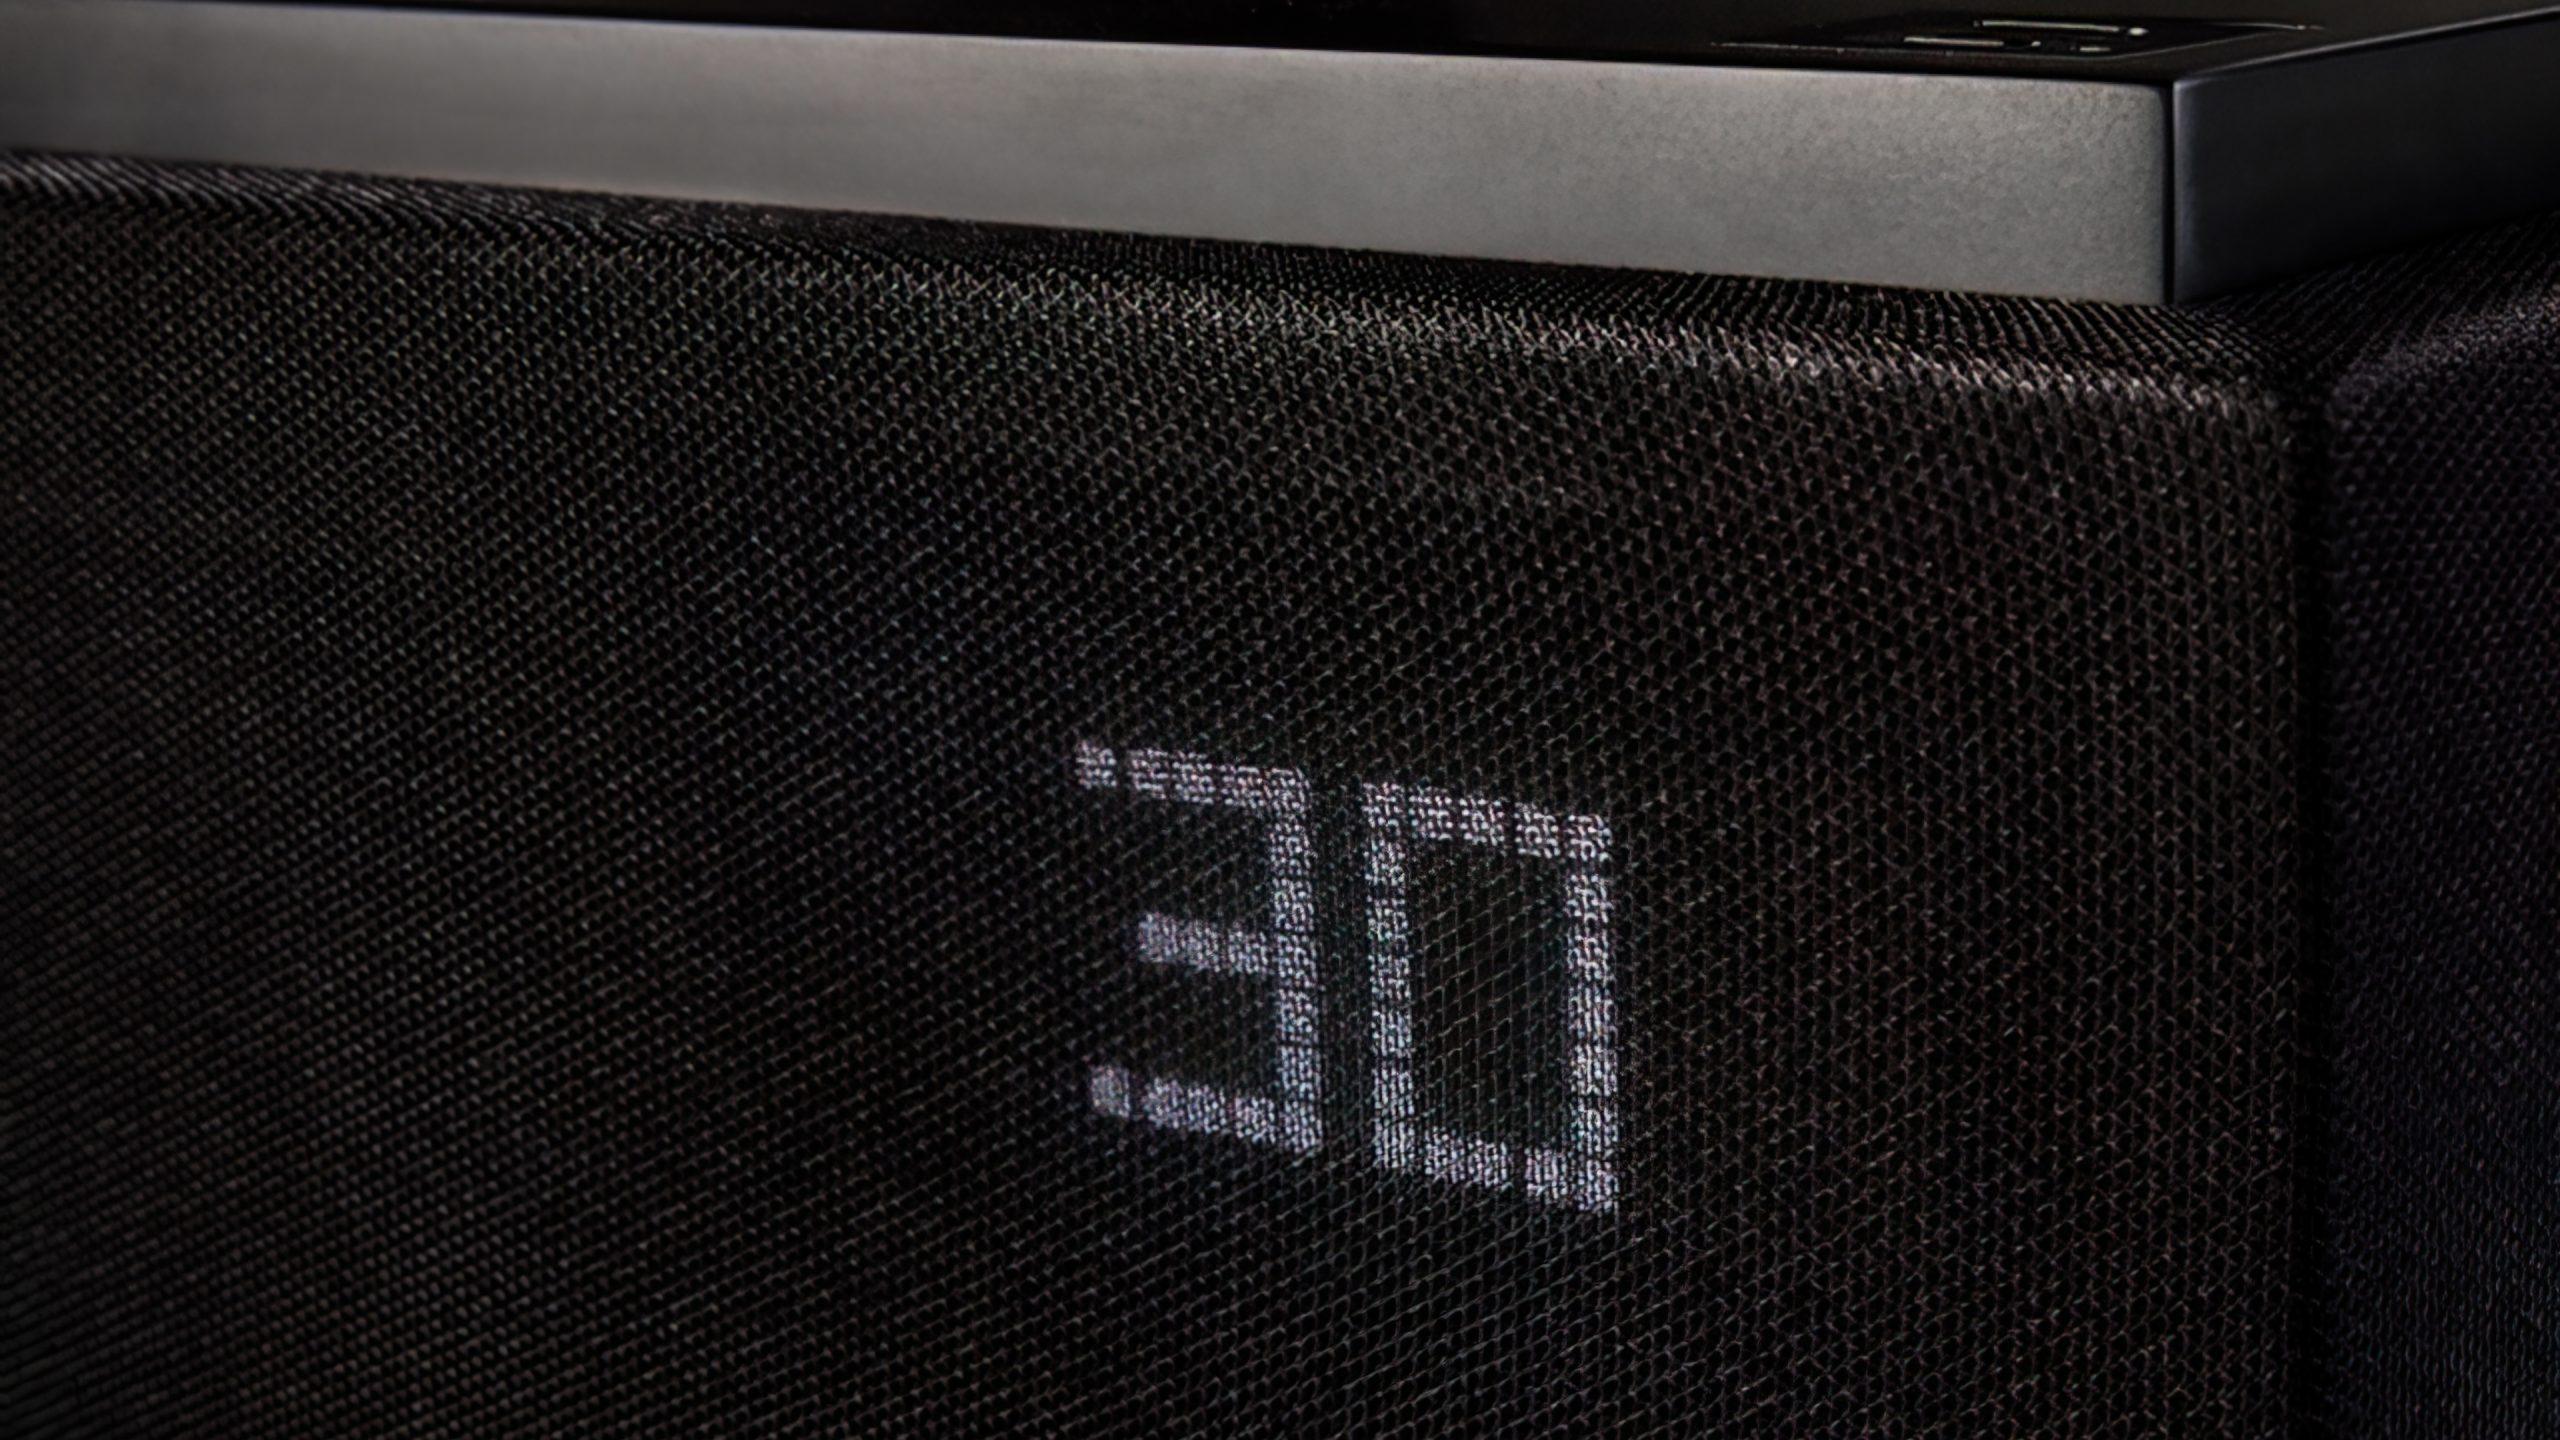 Definitive_Technology_Descend DN12 display